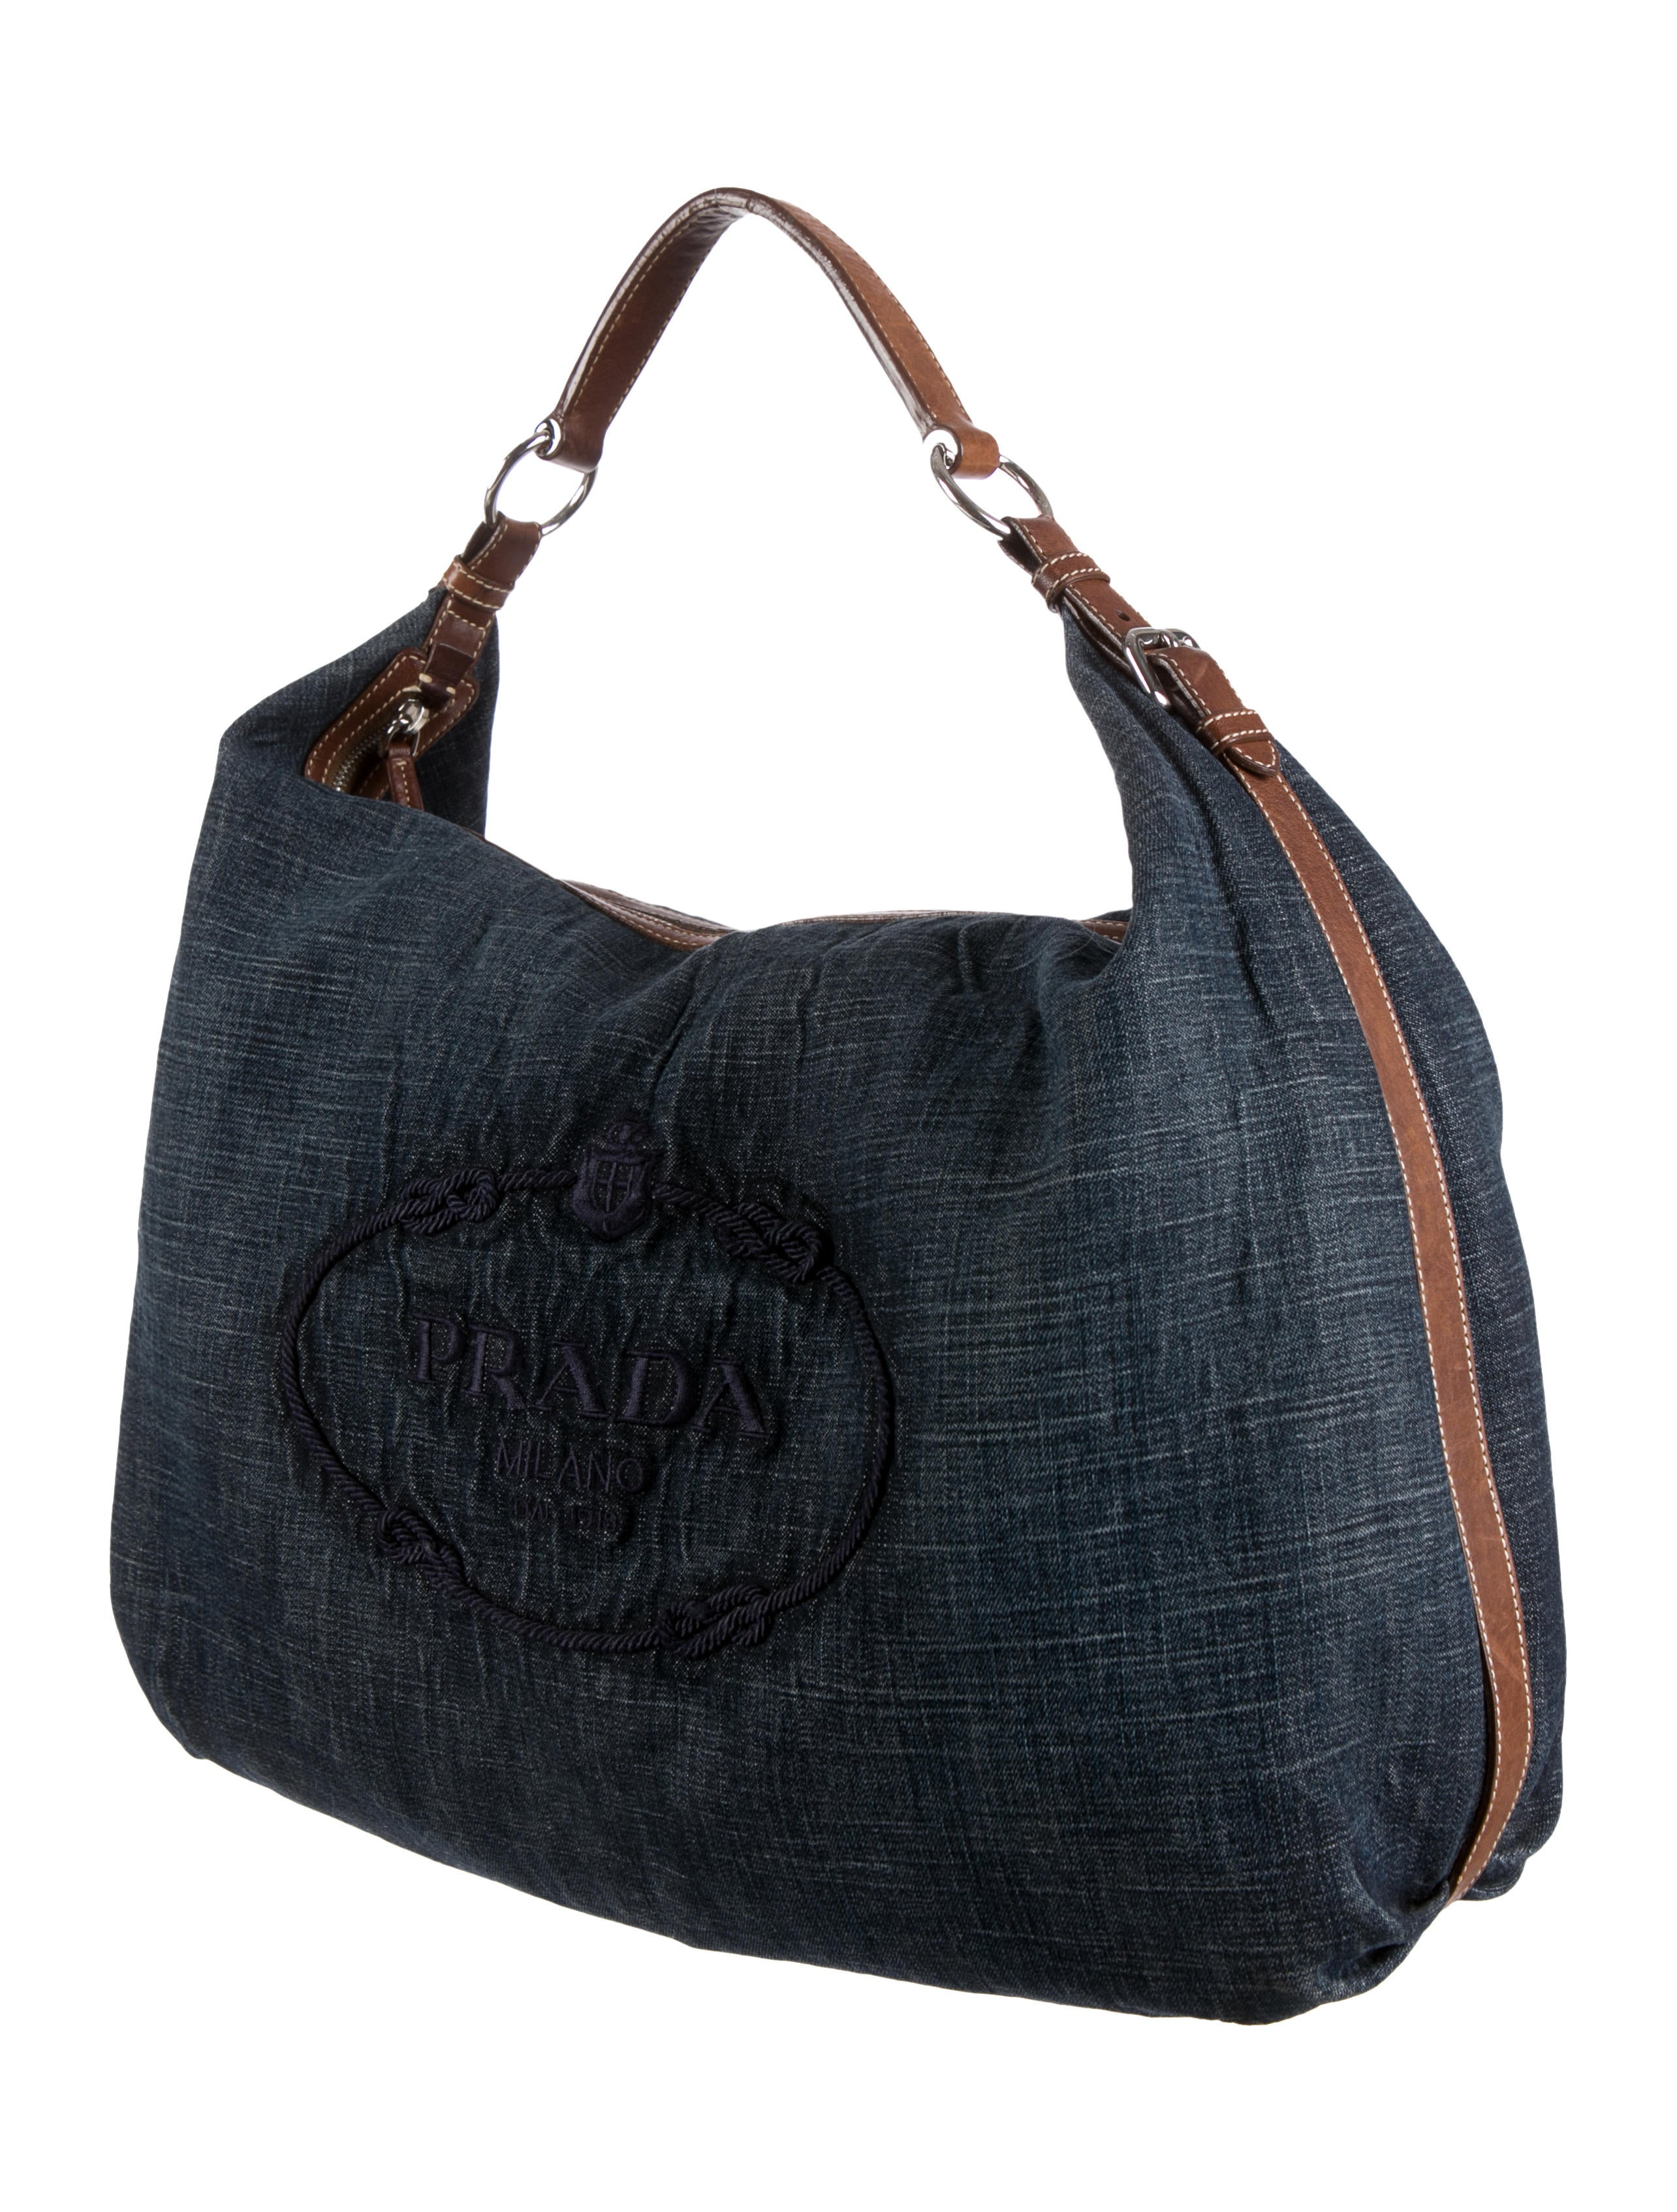 prada messenger bag black nylon - prada denim logo tote, prada leather handbag